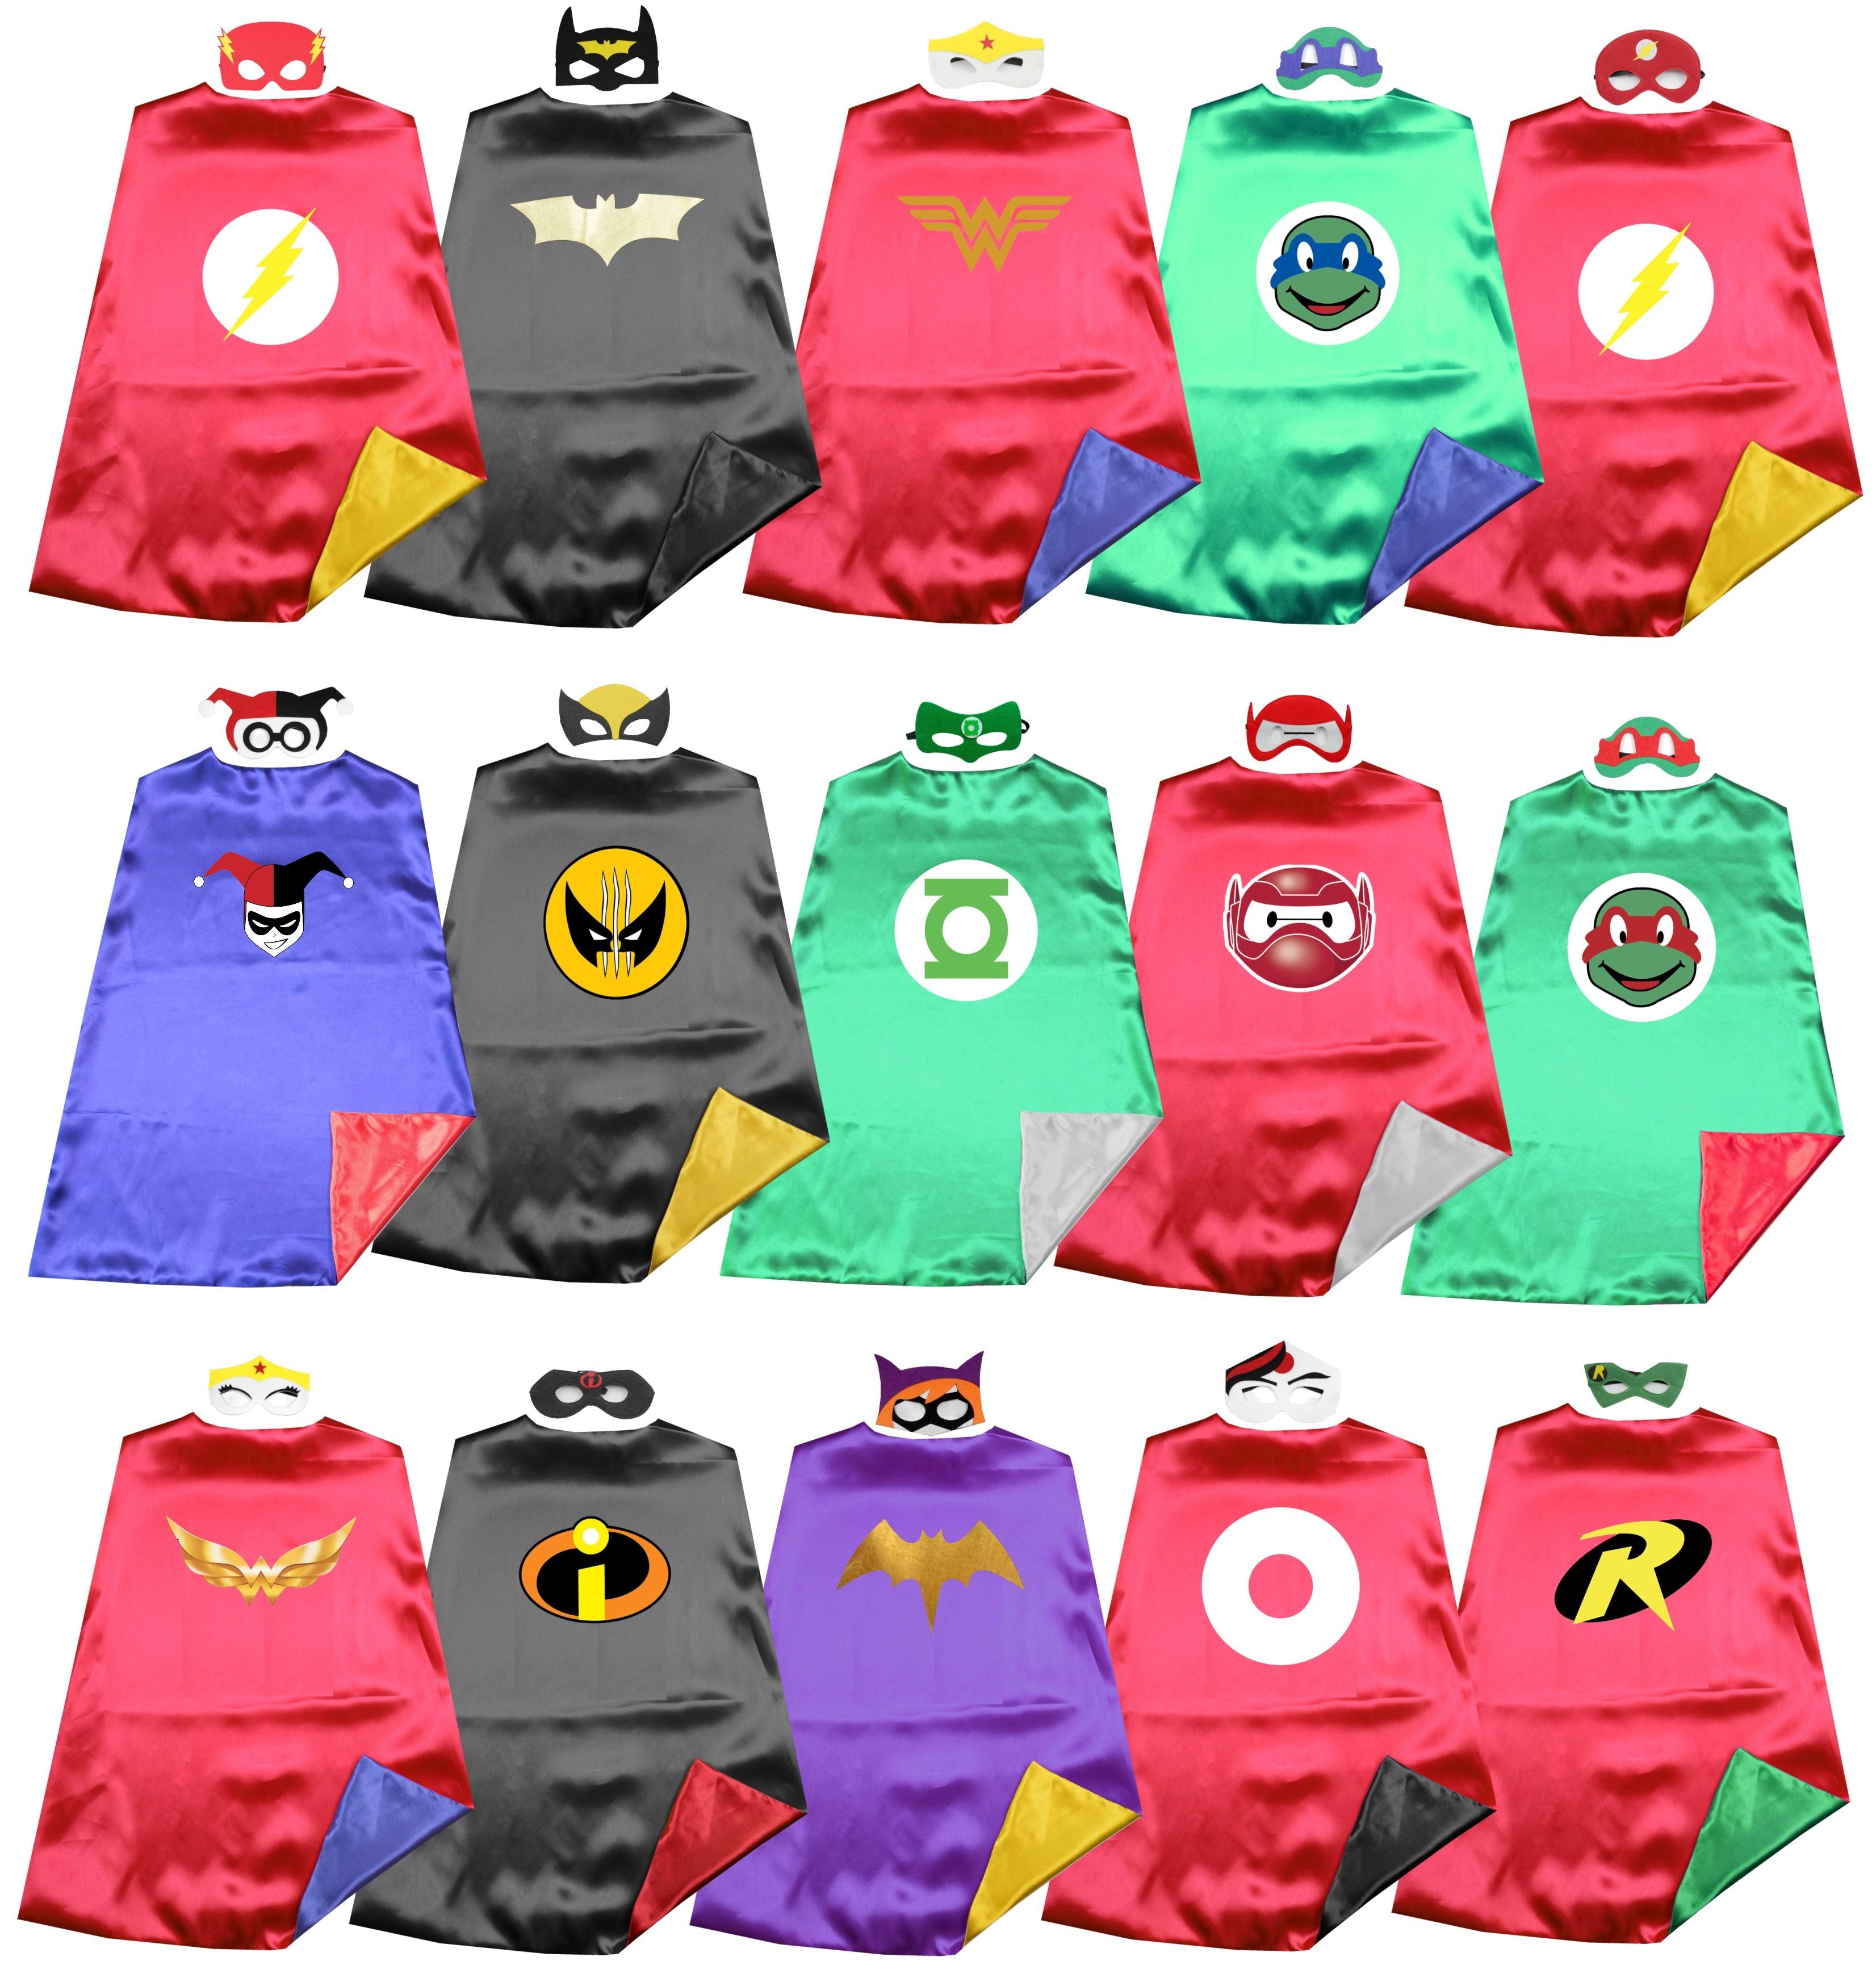 1c6869e0c Satin 2layer Super rod Justice League superhero kids cape+mask Halloween  costume Birthday party favors